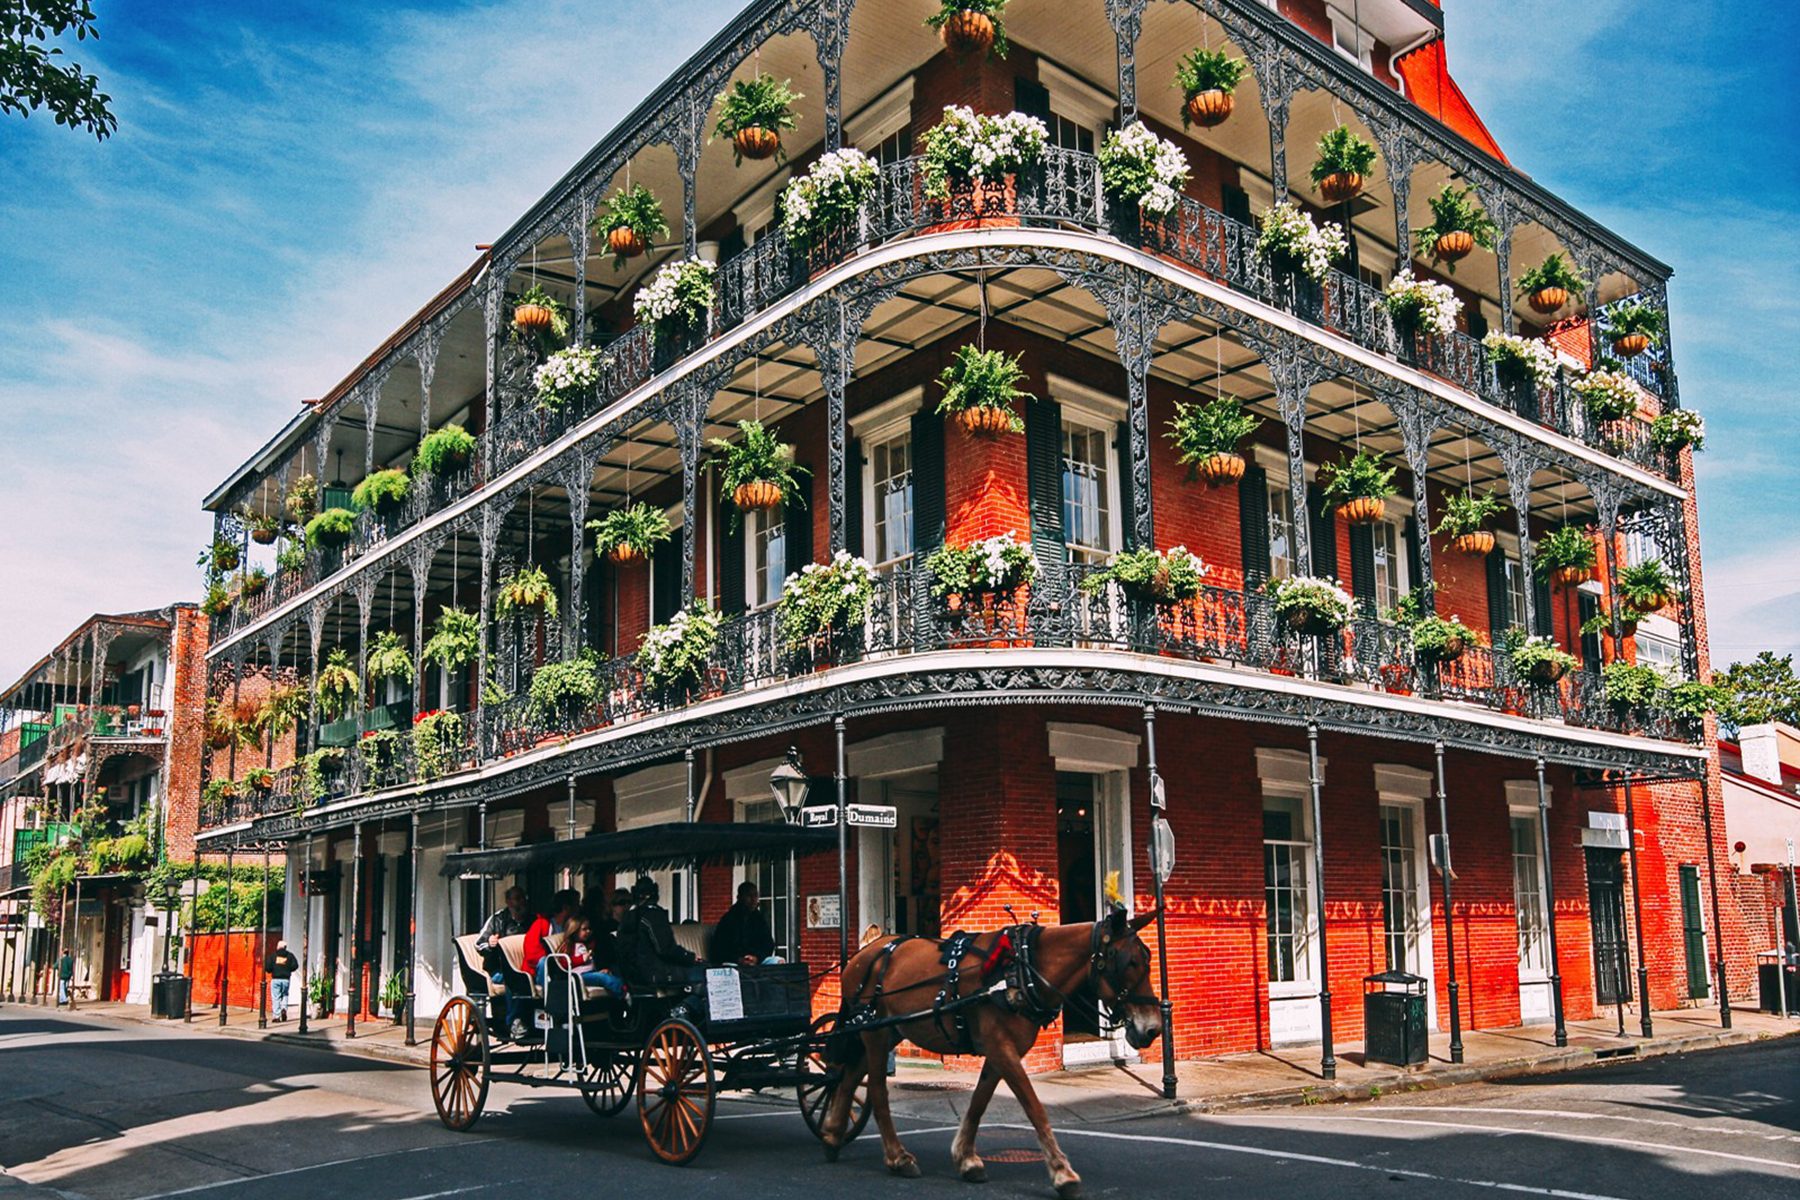 US_New Orleans.jpg